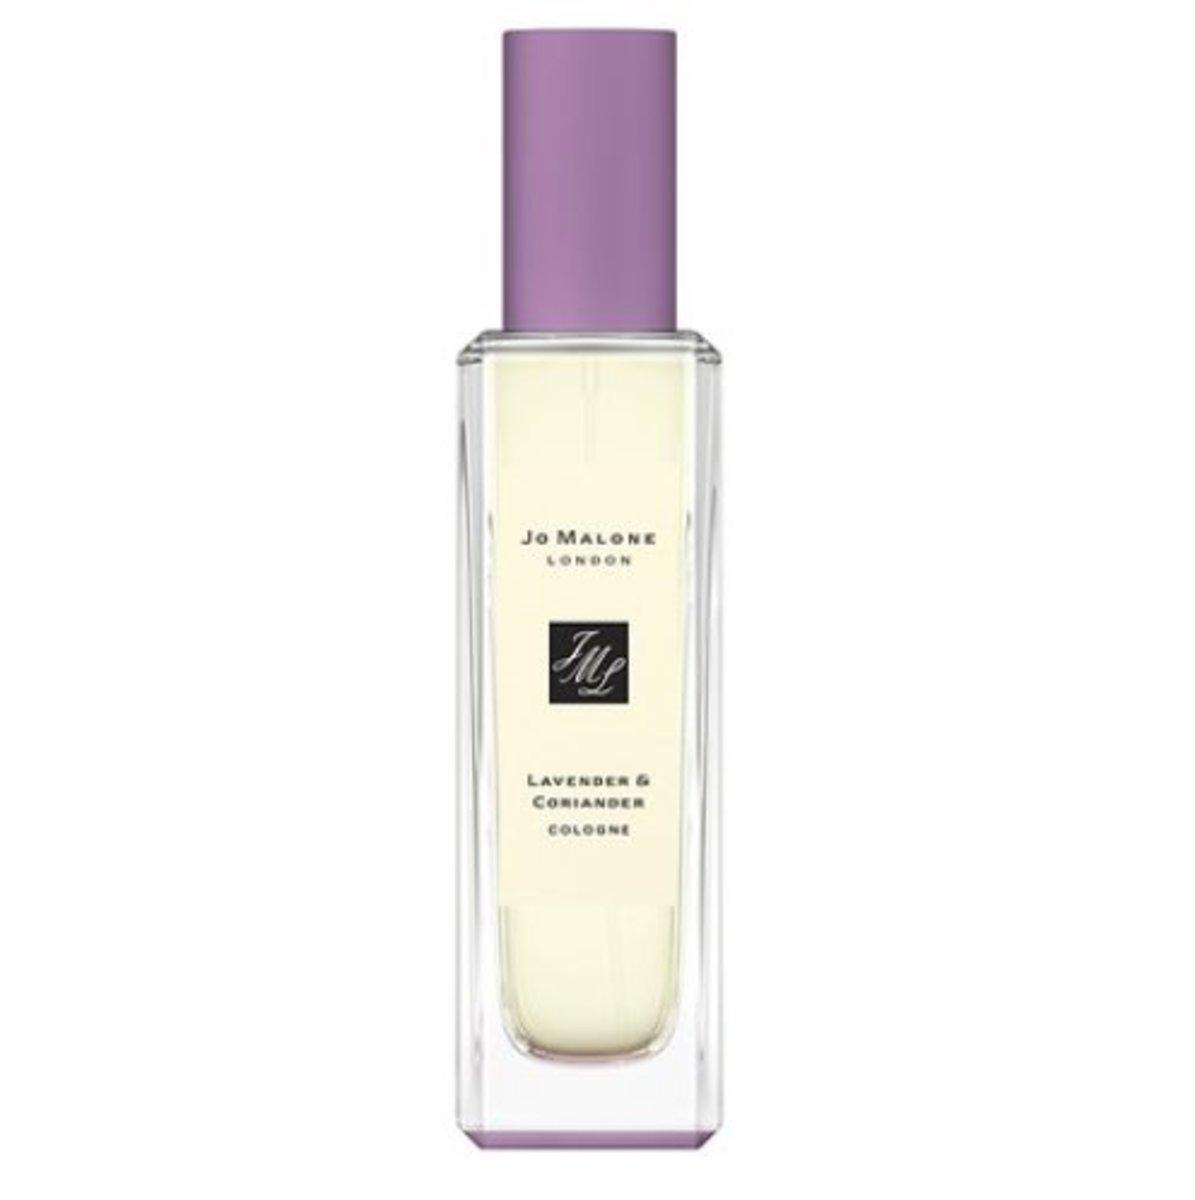 Lavender & Coriander Cologne 30ml (Parallel Import)